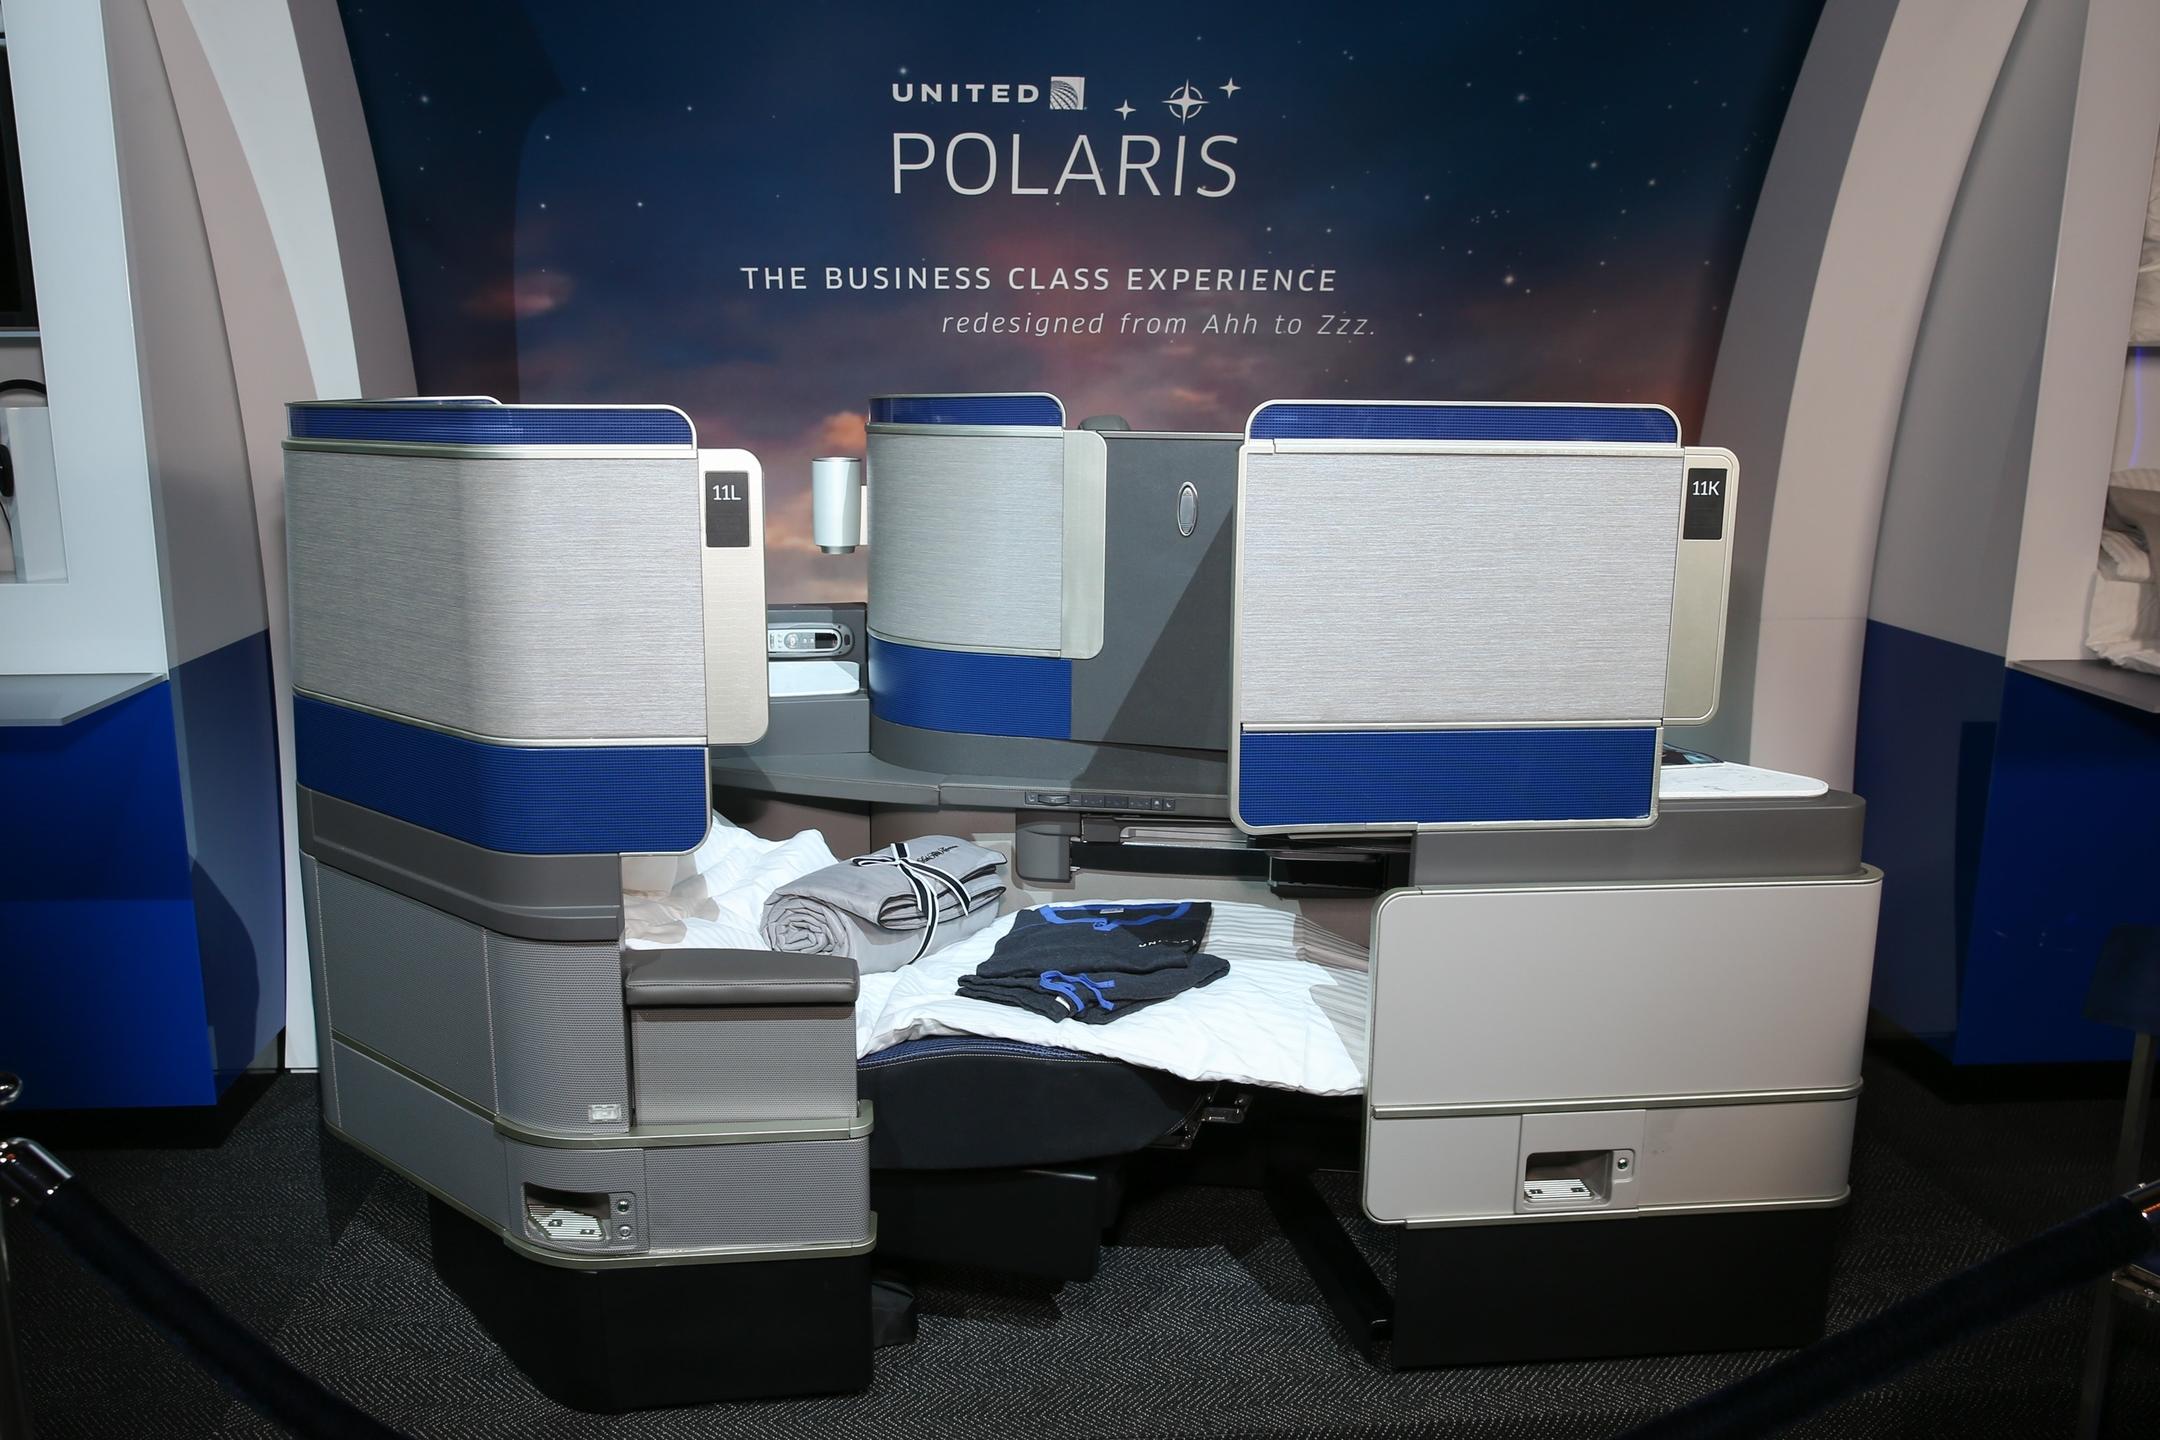 Polaris - mew United Business Class Seats